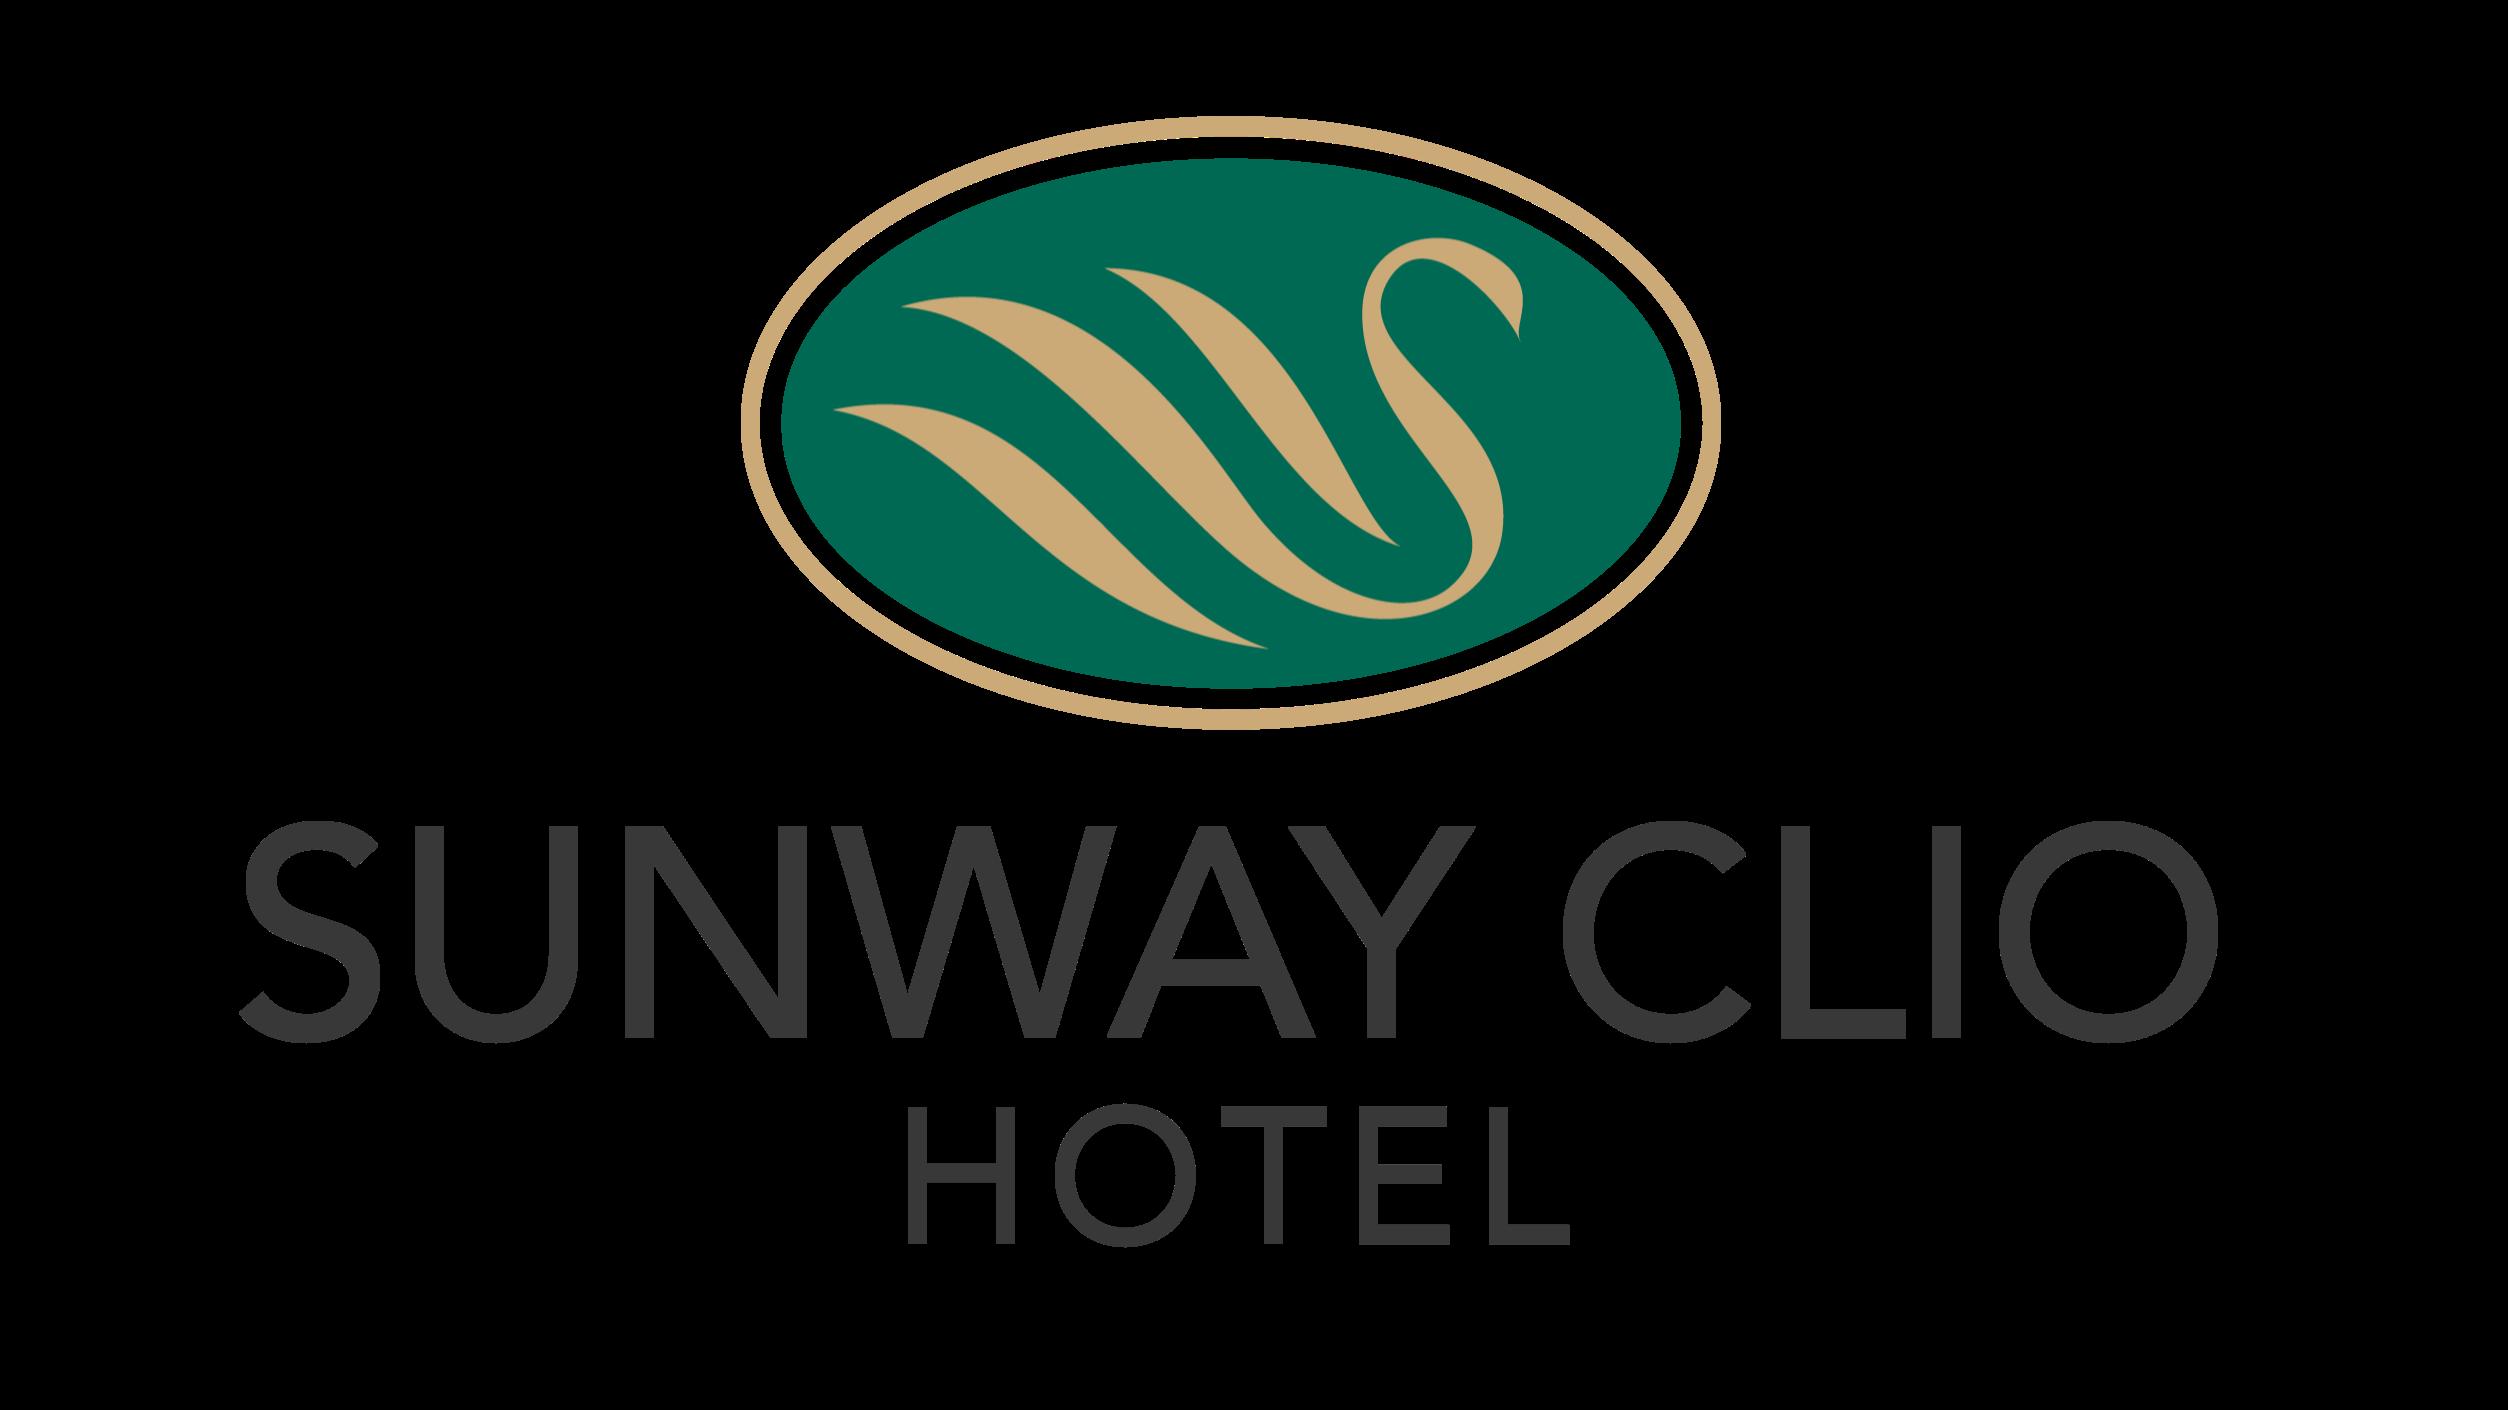 Sunway Clio Hotel logo